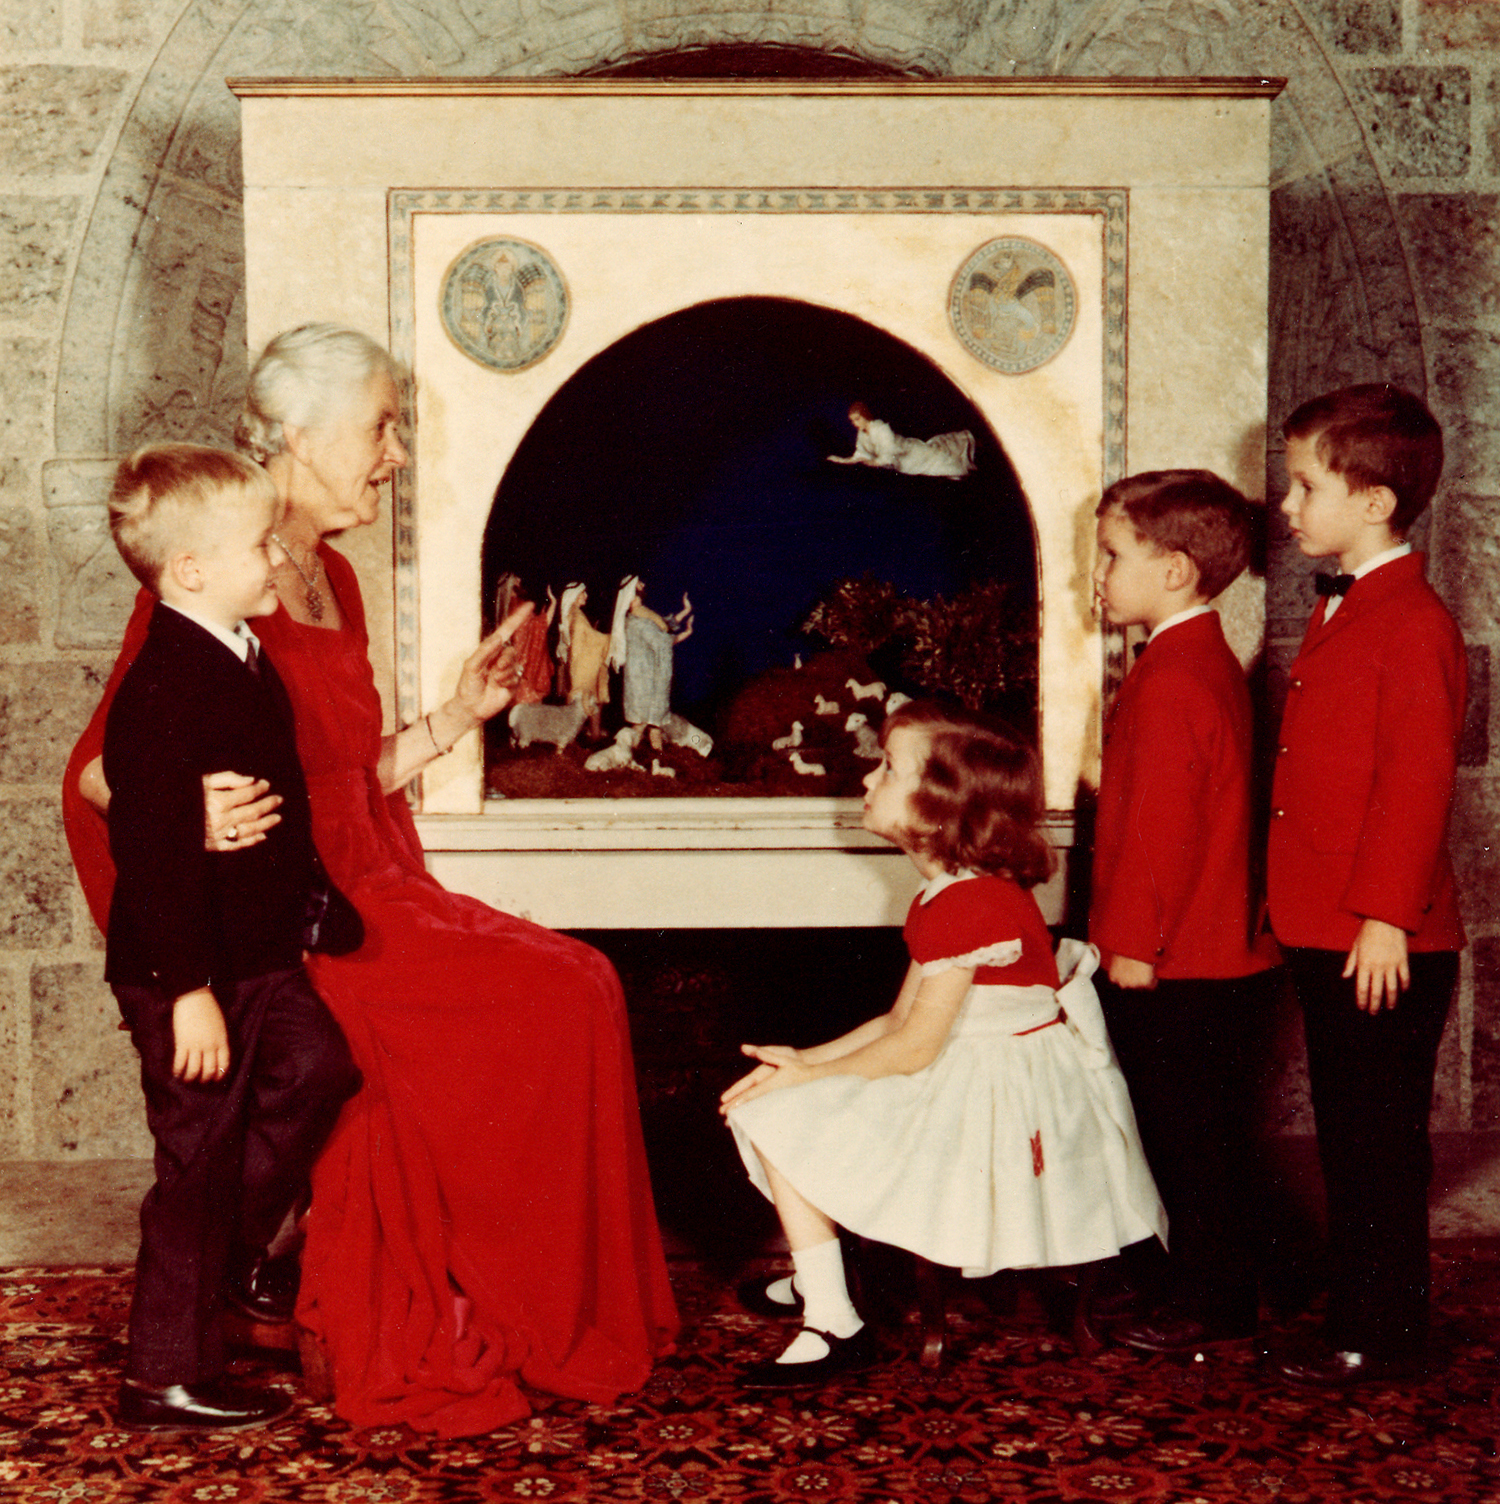 Figure 2: Mildred Pitcairn at Glencairn with her grandchildren in 1967.